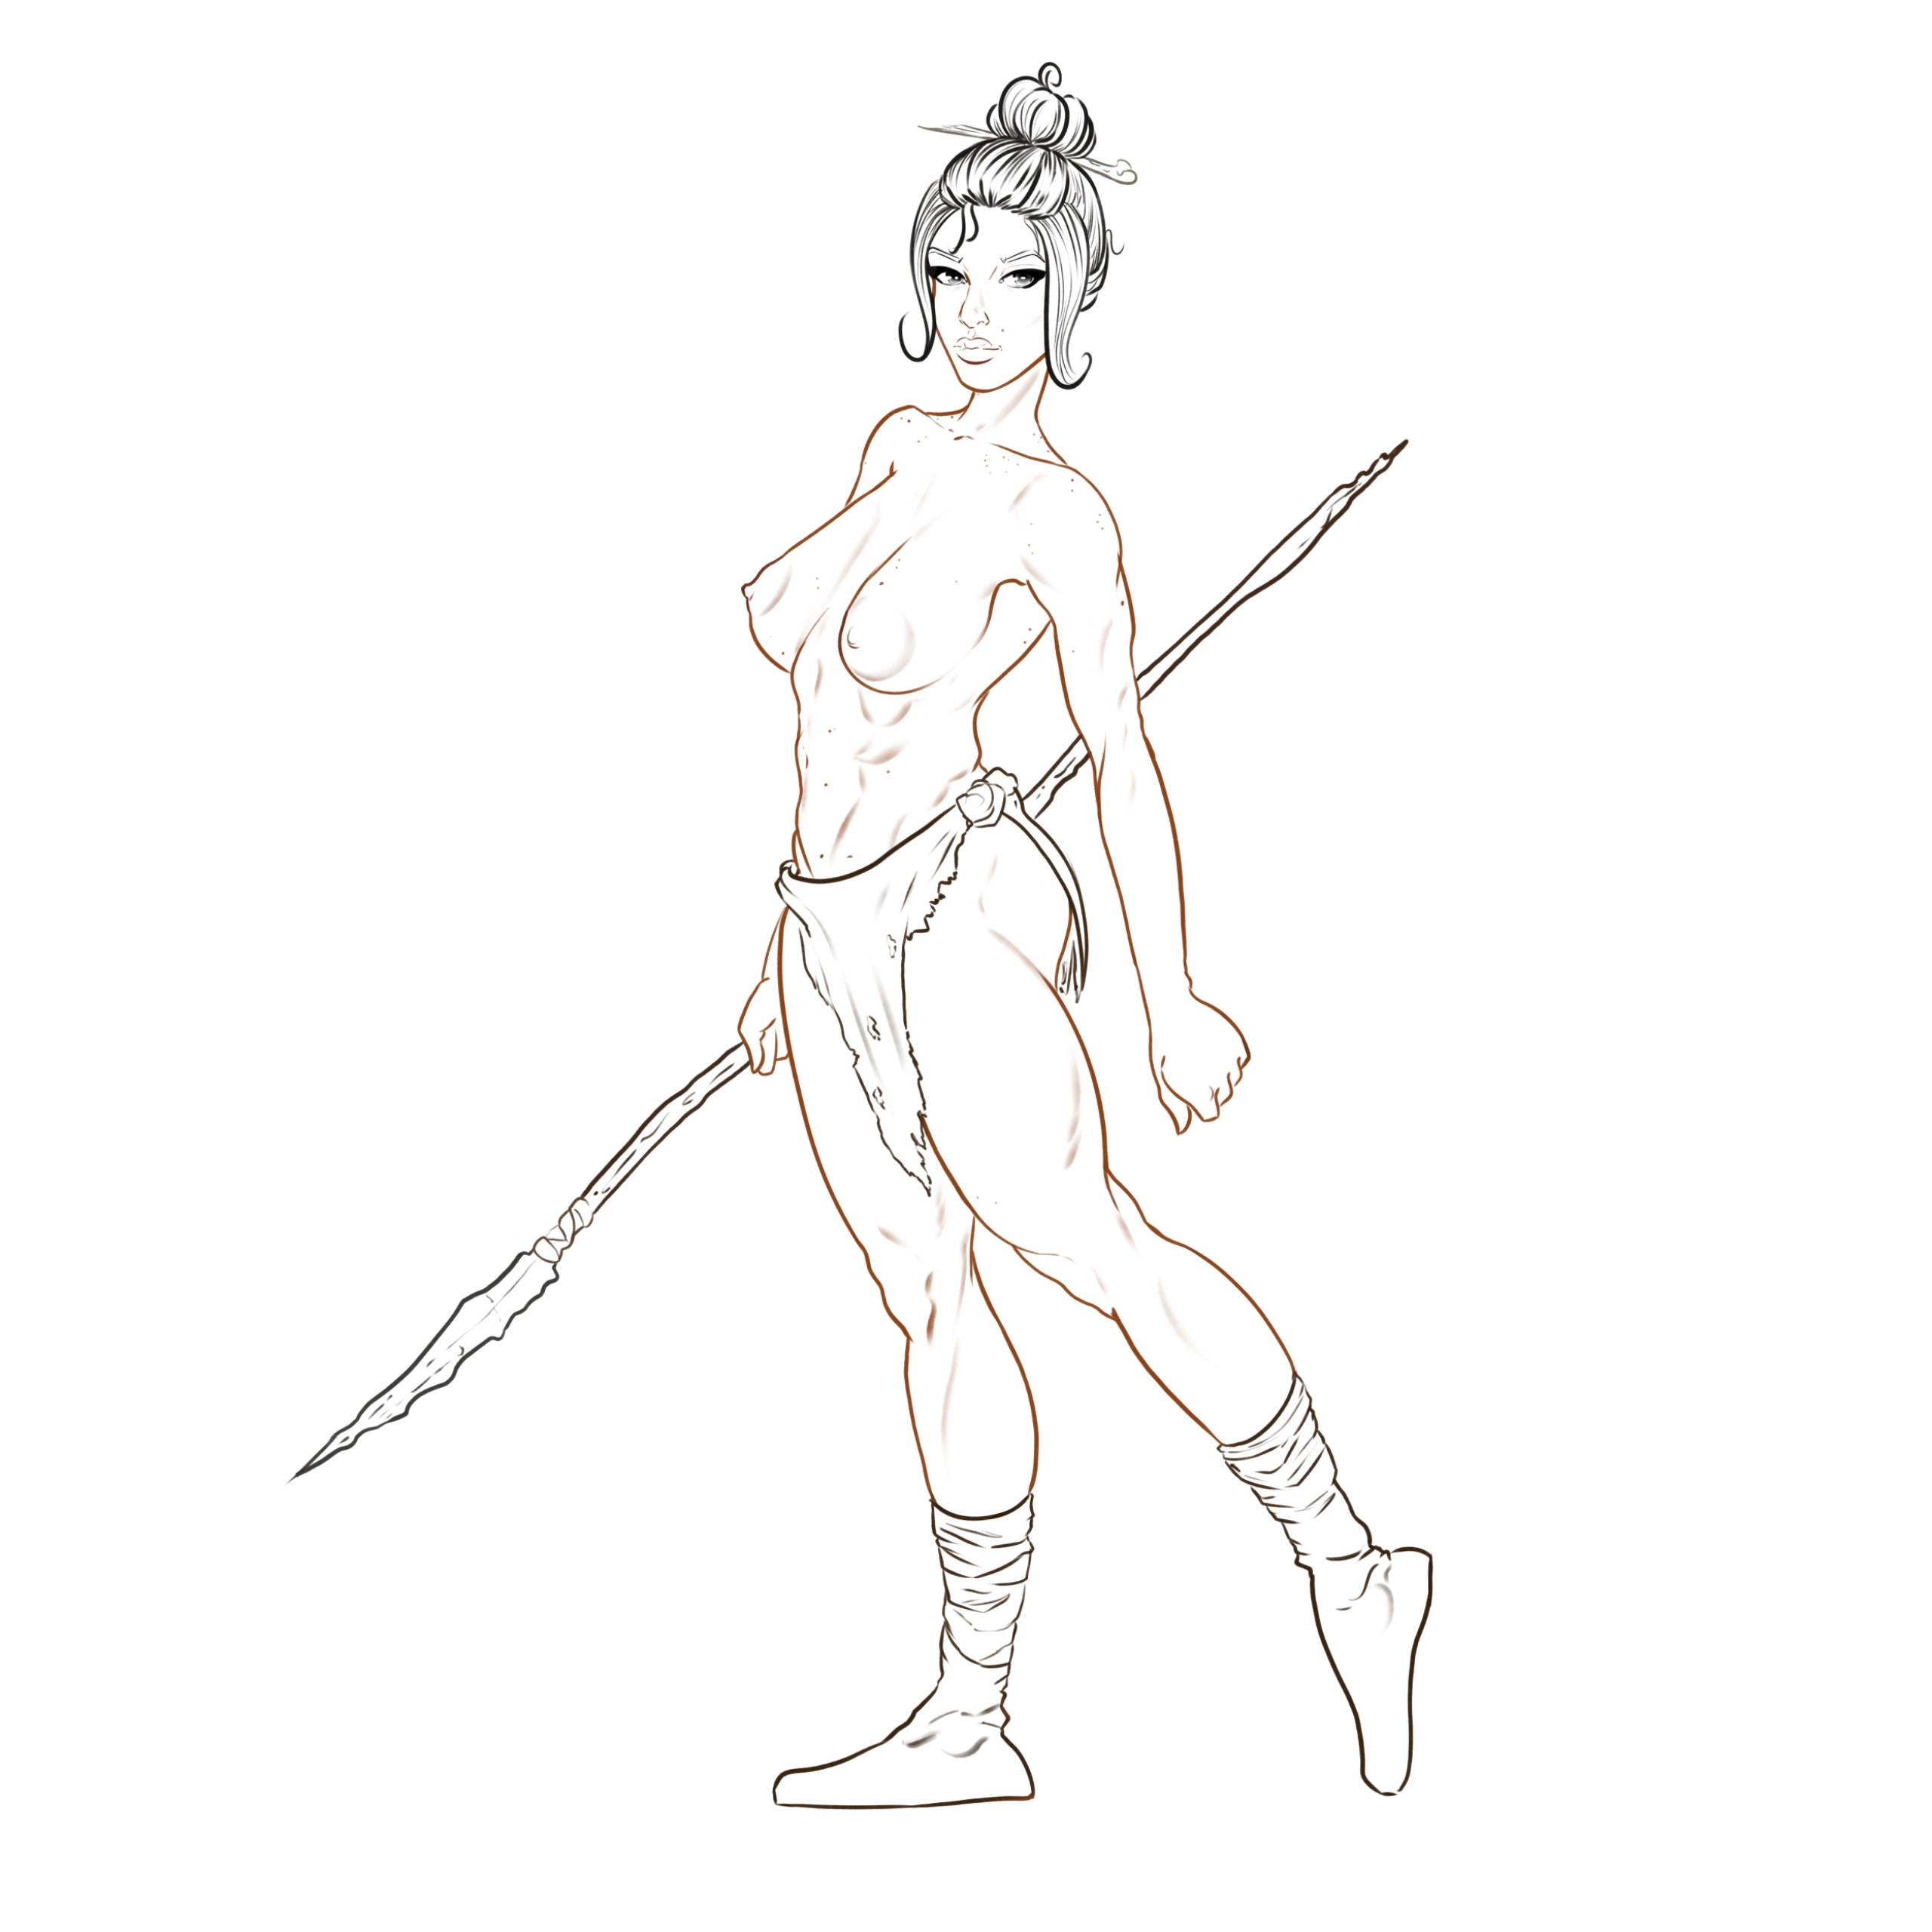 Digital sketch commission - drawing - tamhutart | ello